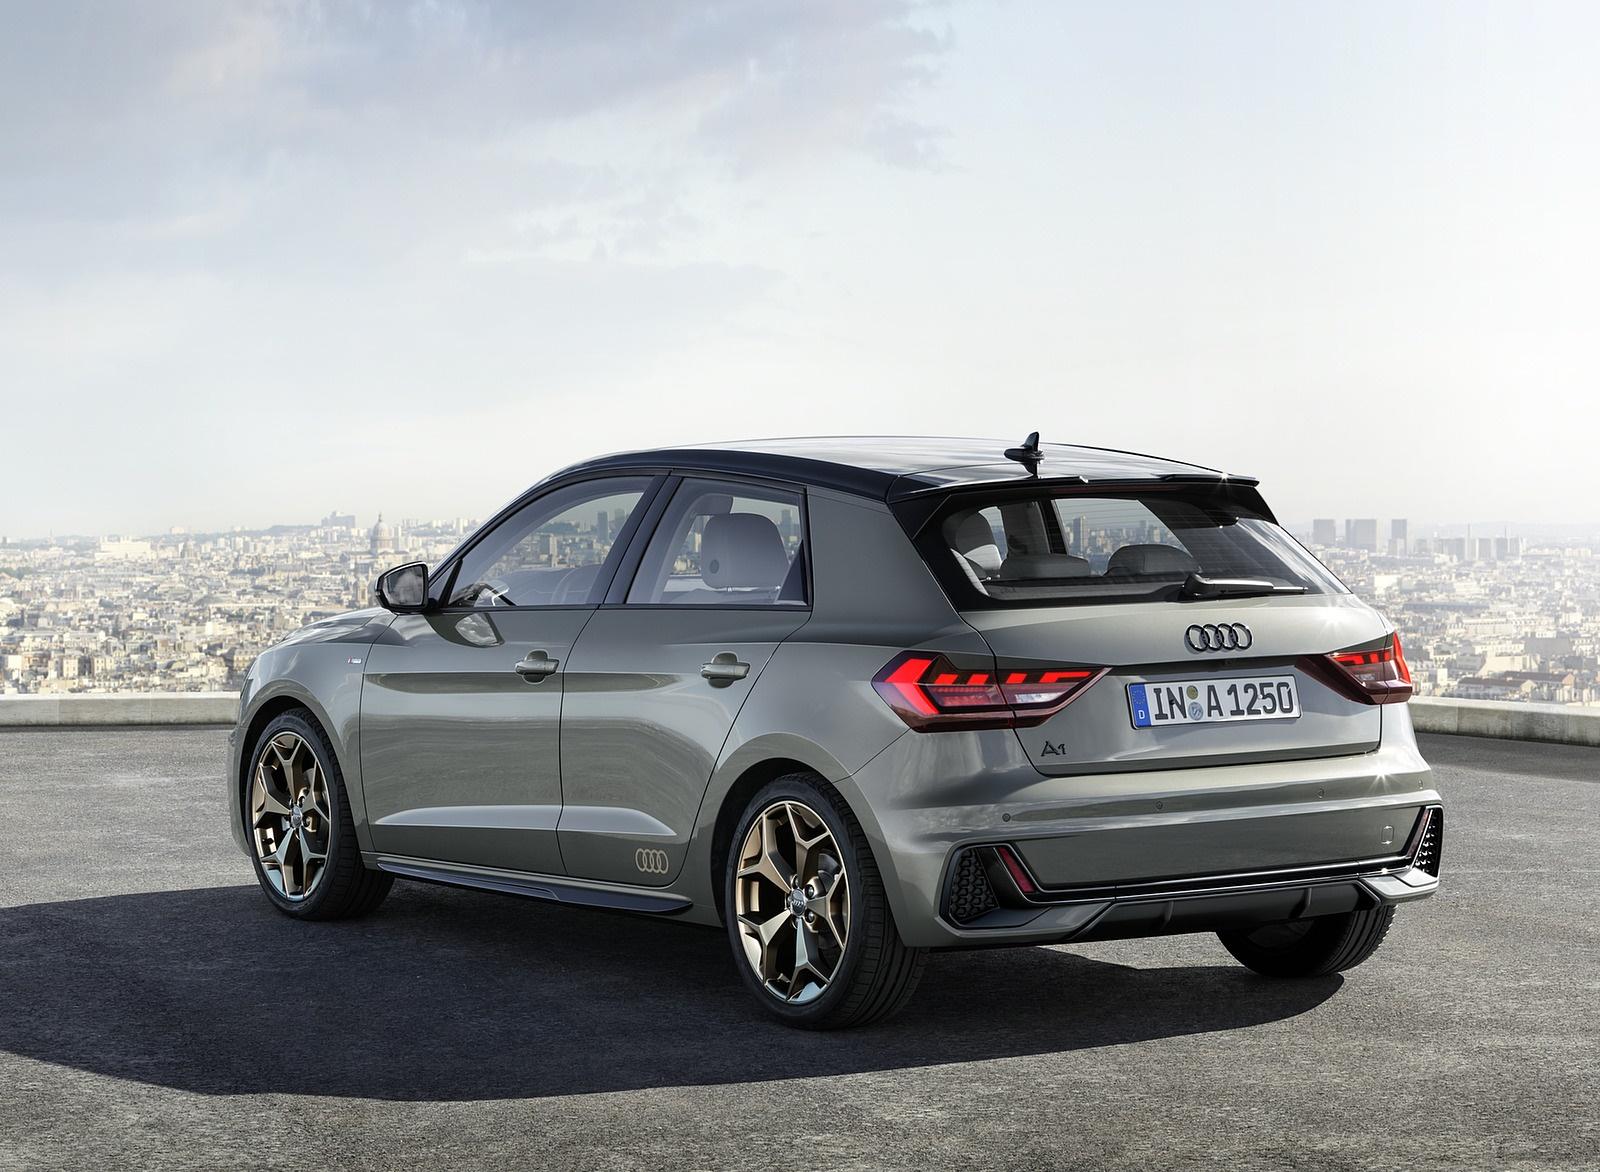 2019 Audi A1 Sportback (Color: Chronos Grey) Rear Three-Quarter Wallpapers (9)